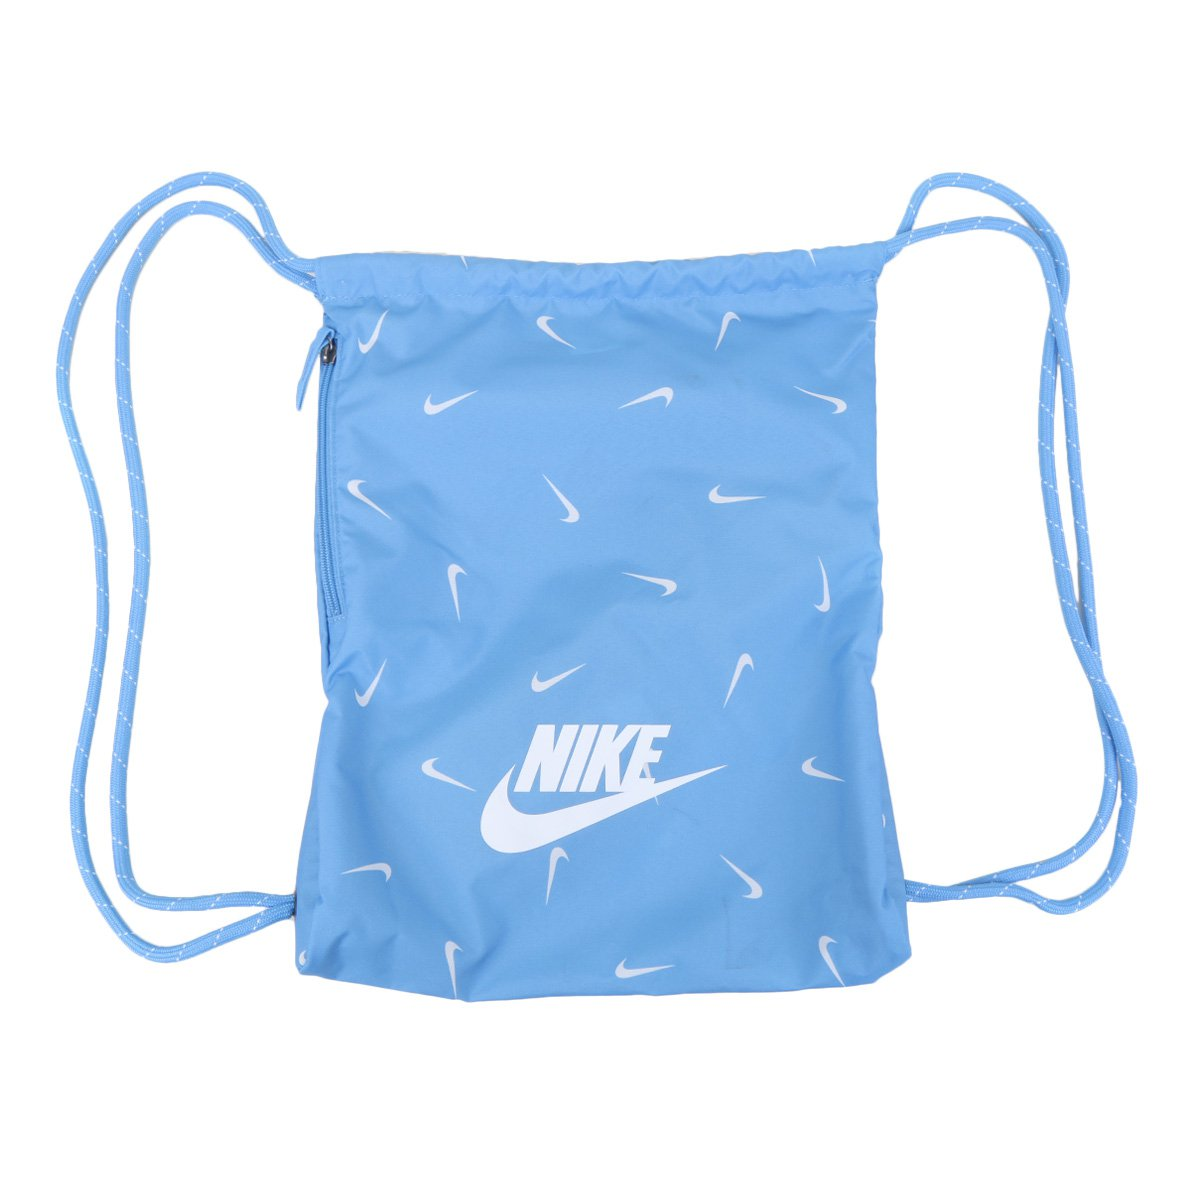 Sacola Nike Gymsack Estampada